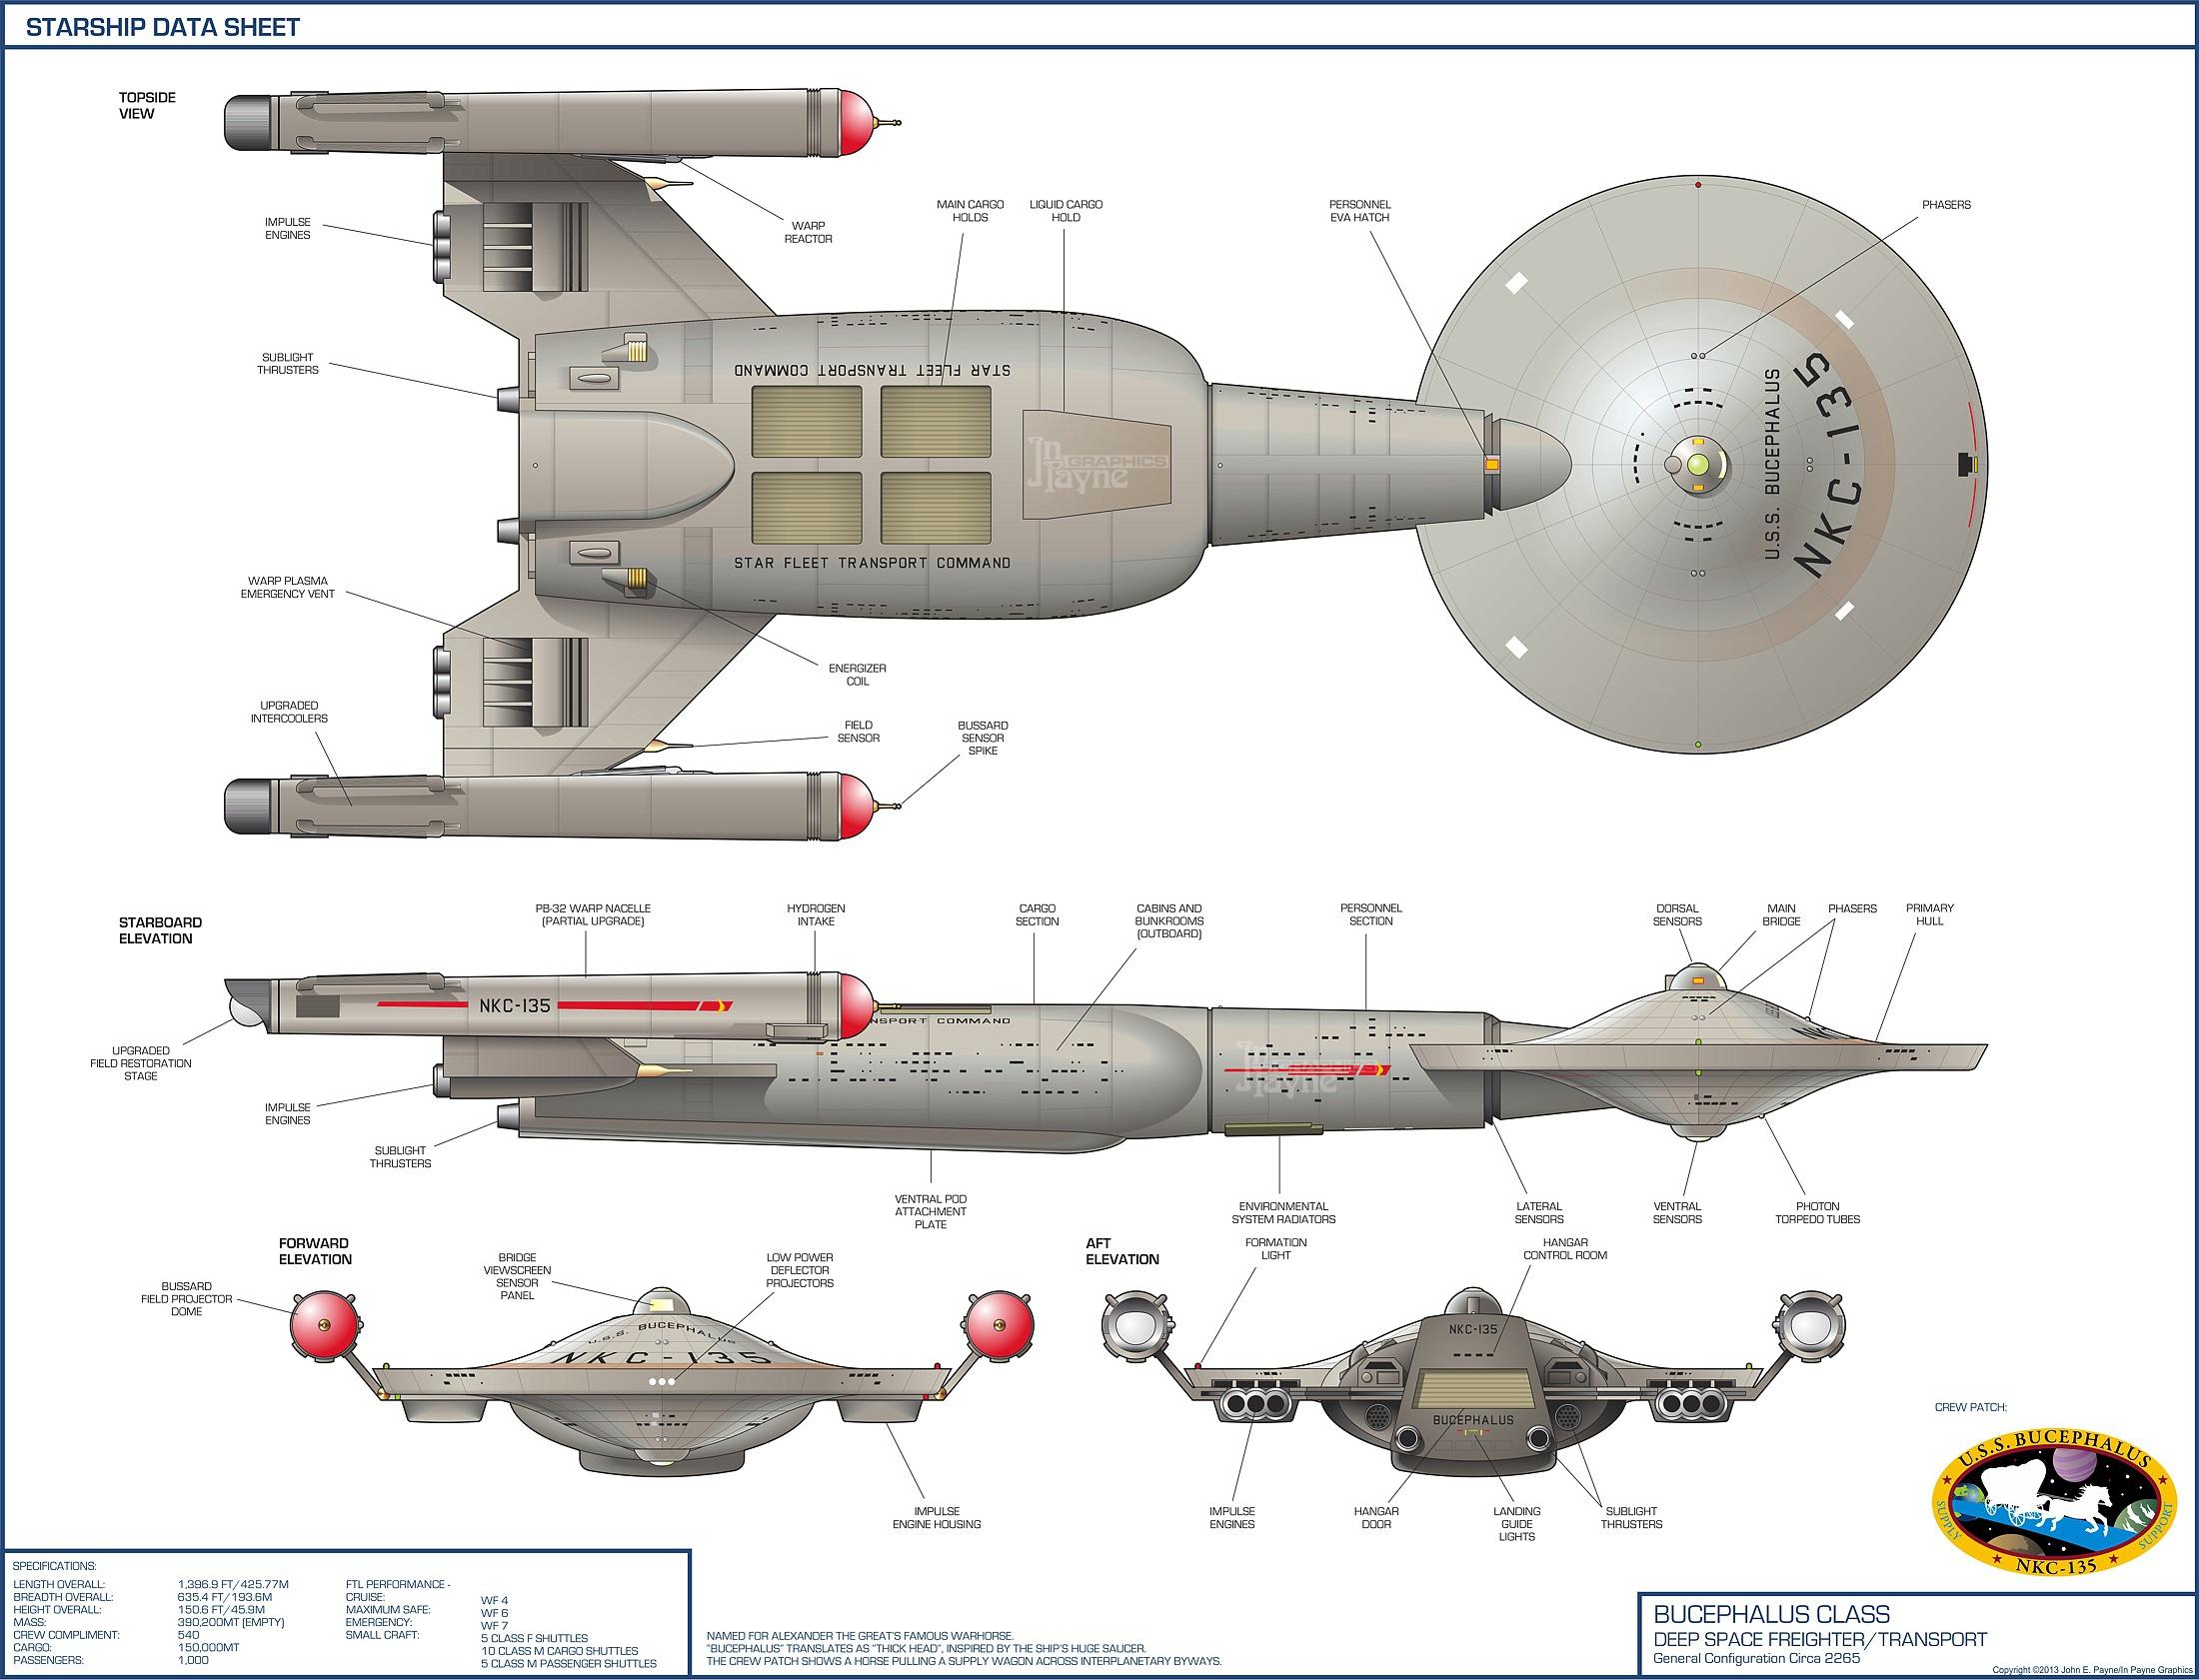 Starship Schematic Database - Star Trek